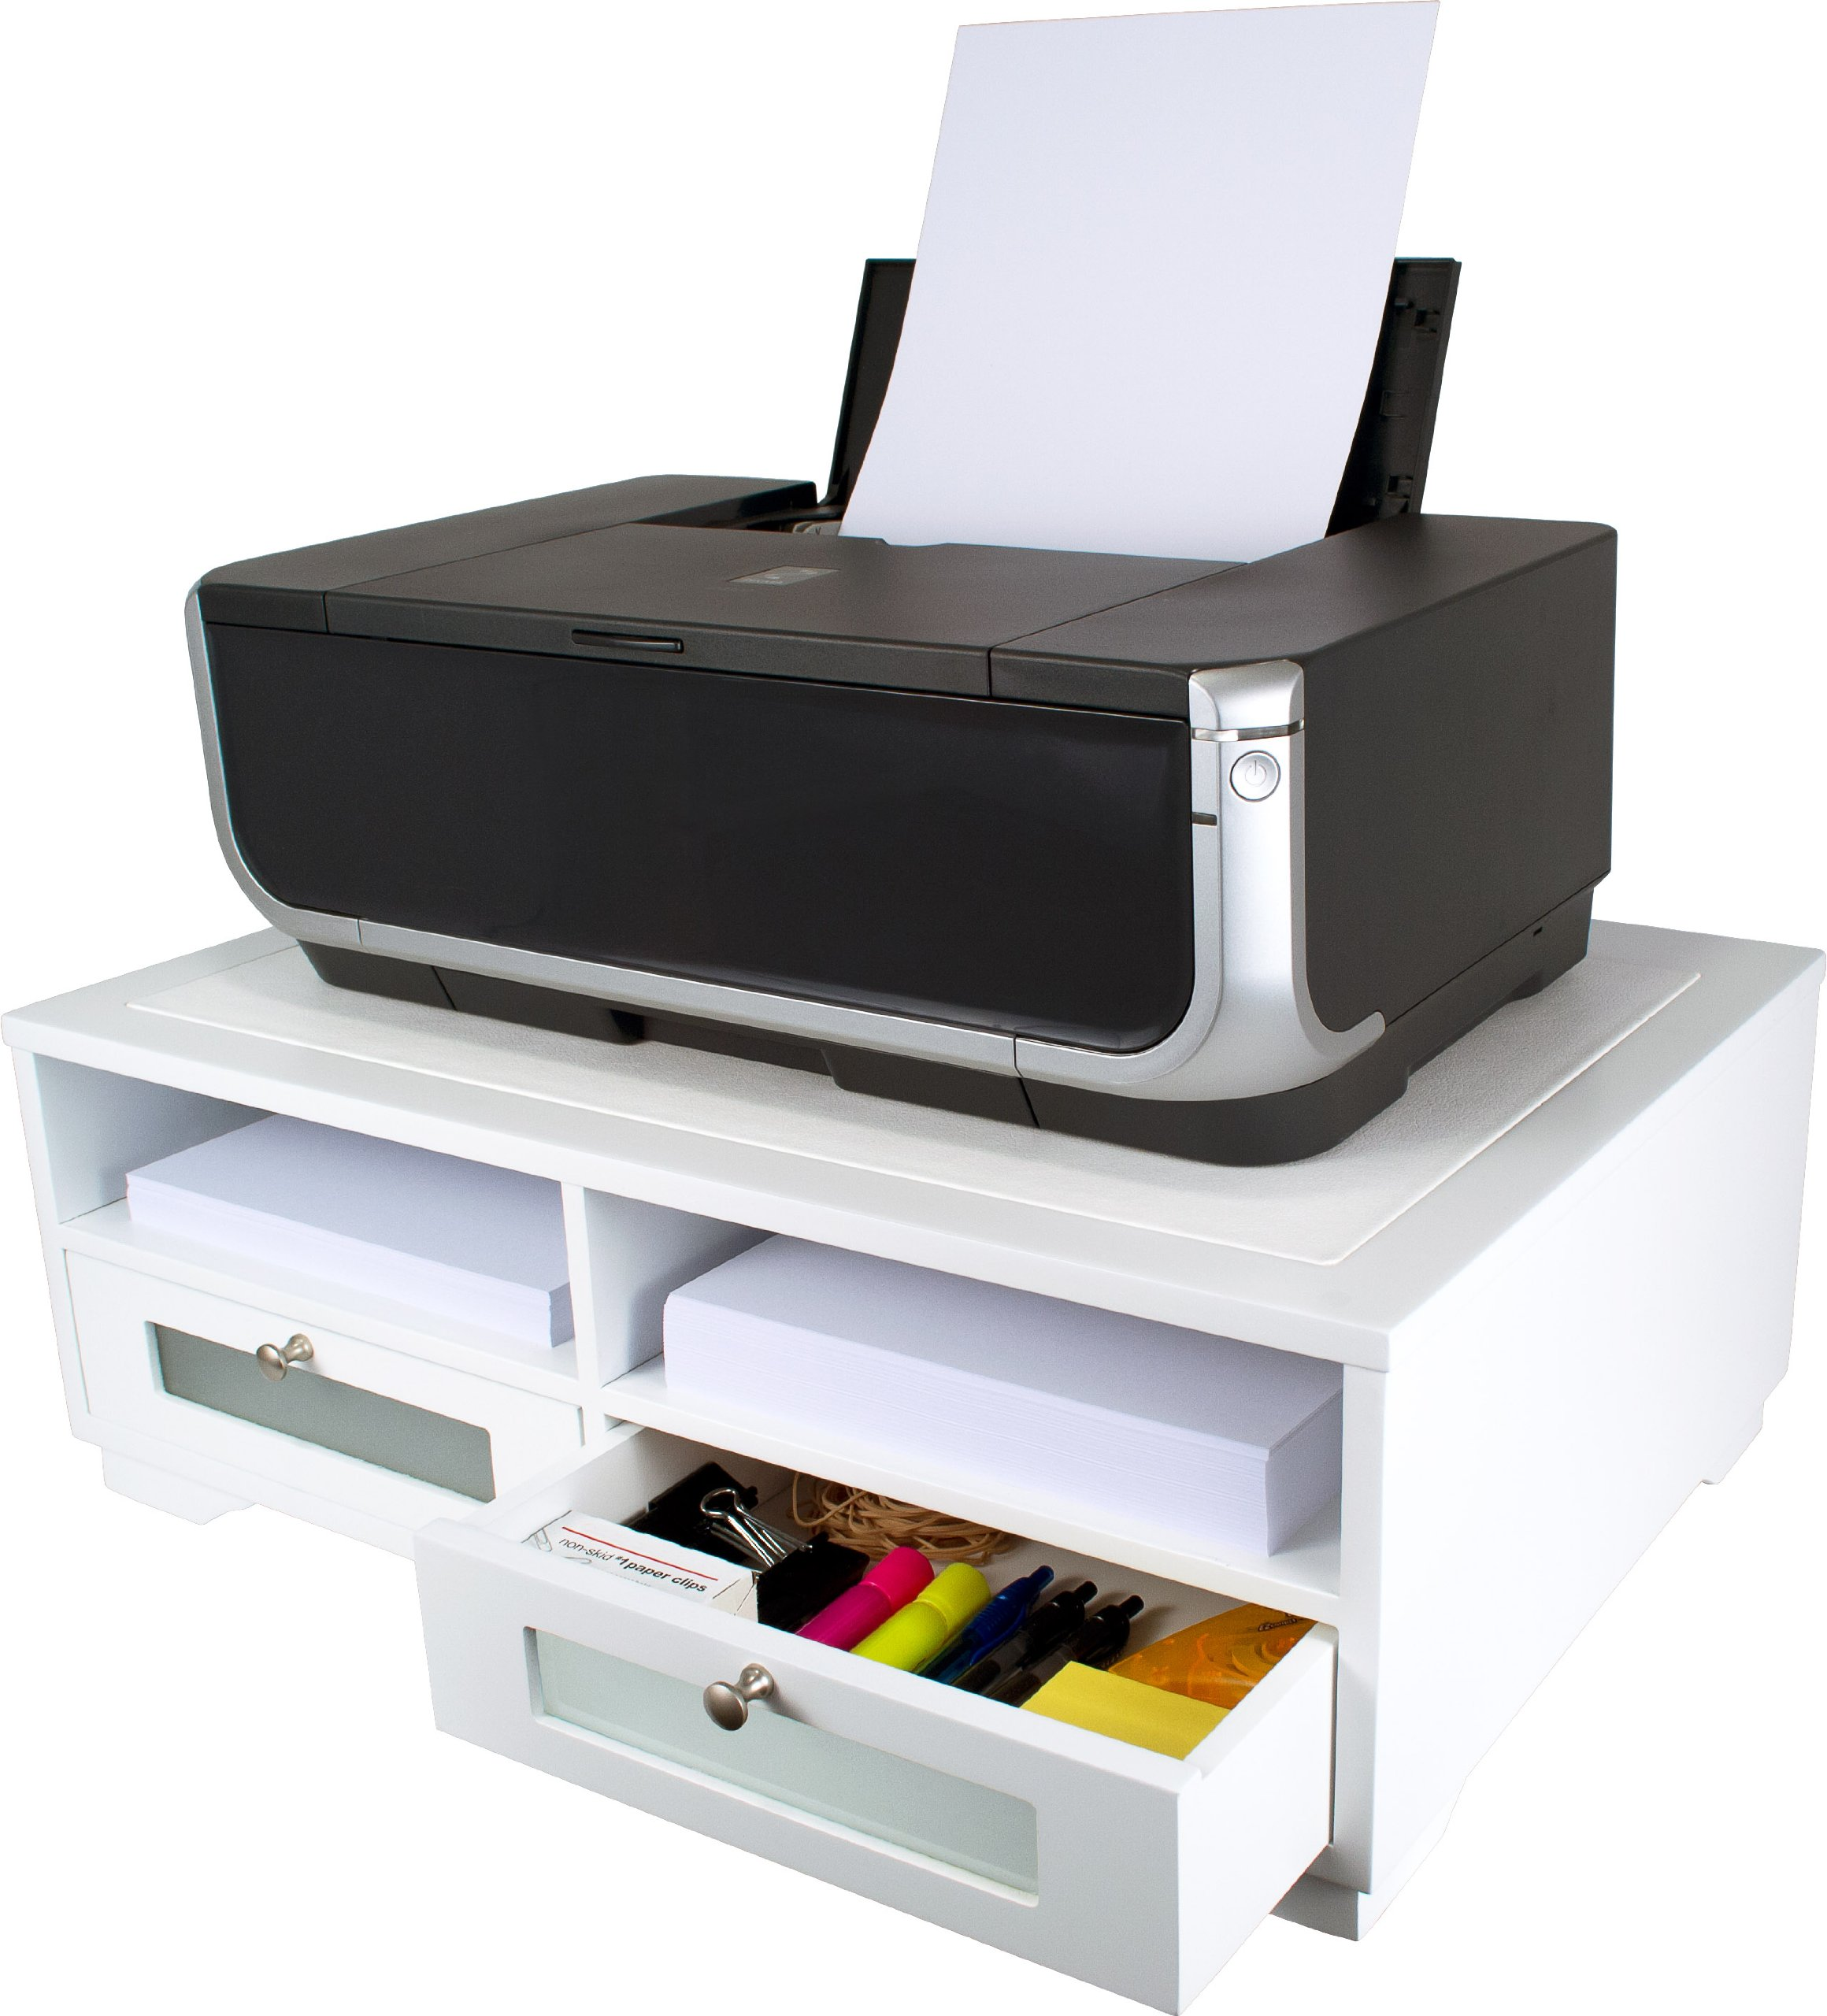 Victor W1130 Pure White Wood Printer Stand